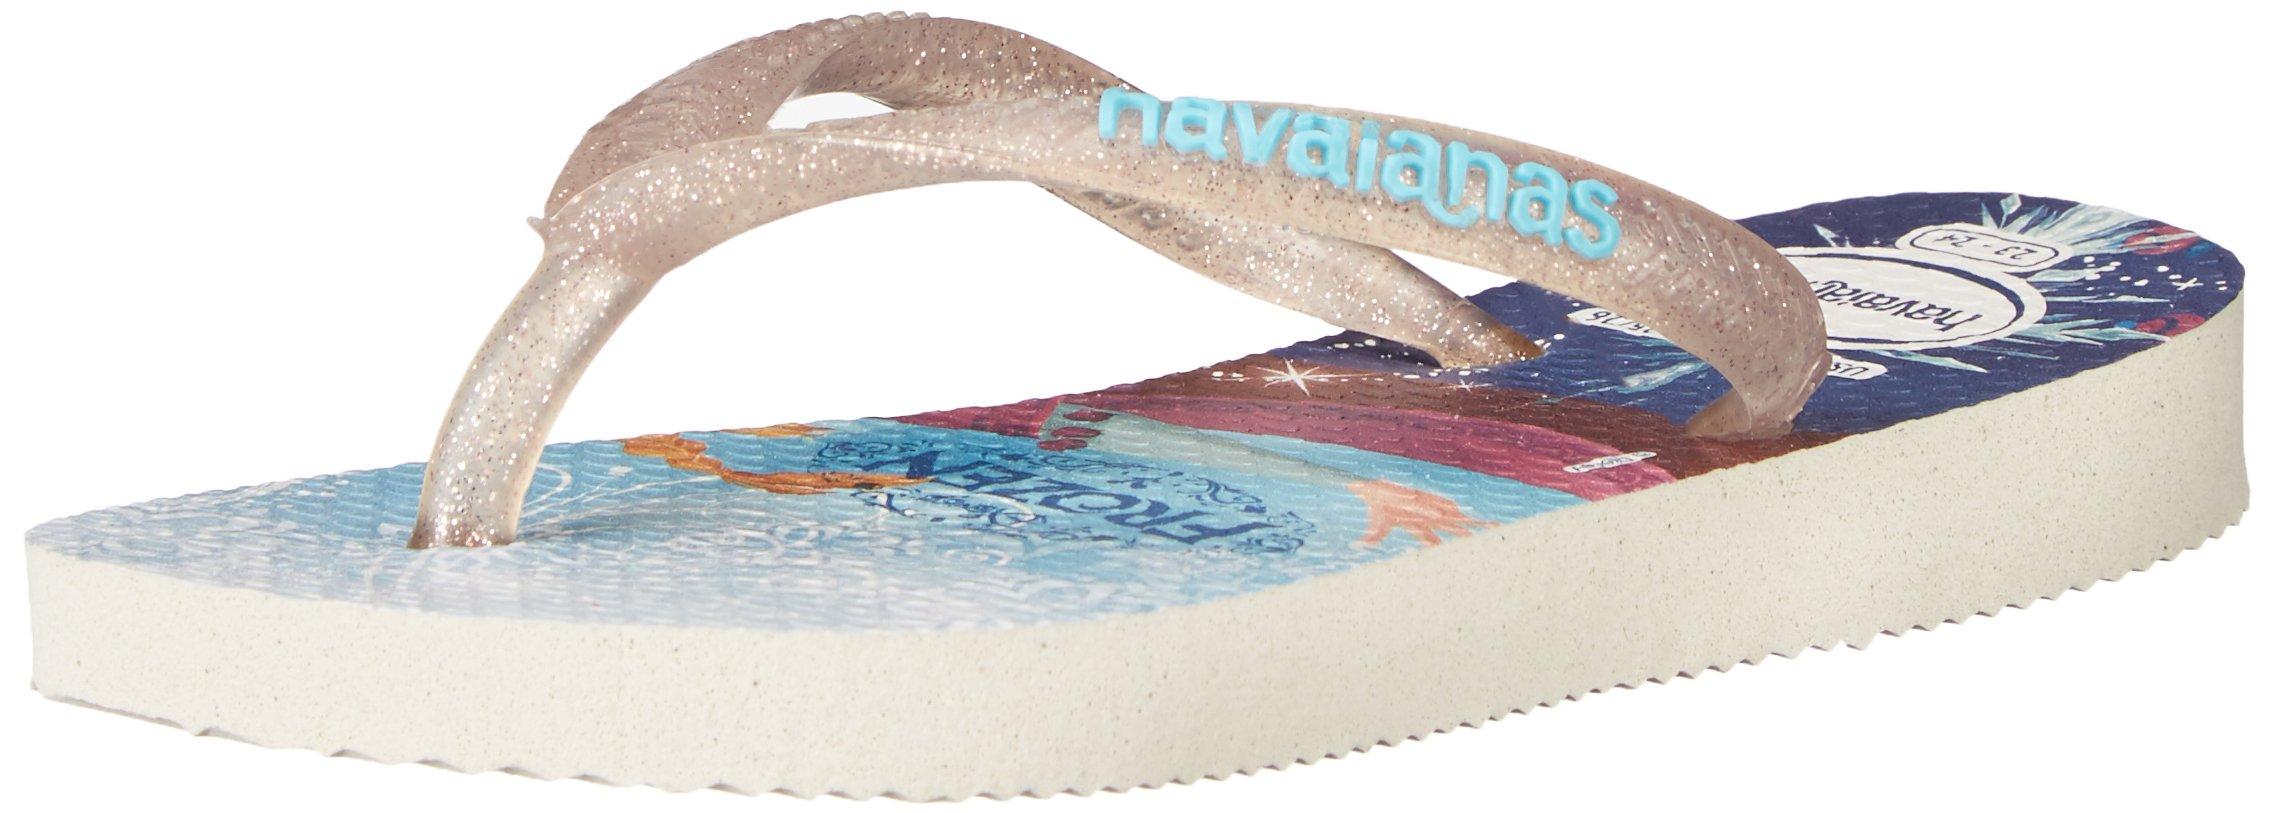 Havaianas Kids Slim Princess Sandal Flip Flops (Toddler/Little Kid), White, 33-34 BR/3-4 M US Little Kid by Havaianas (Image #1)